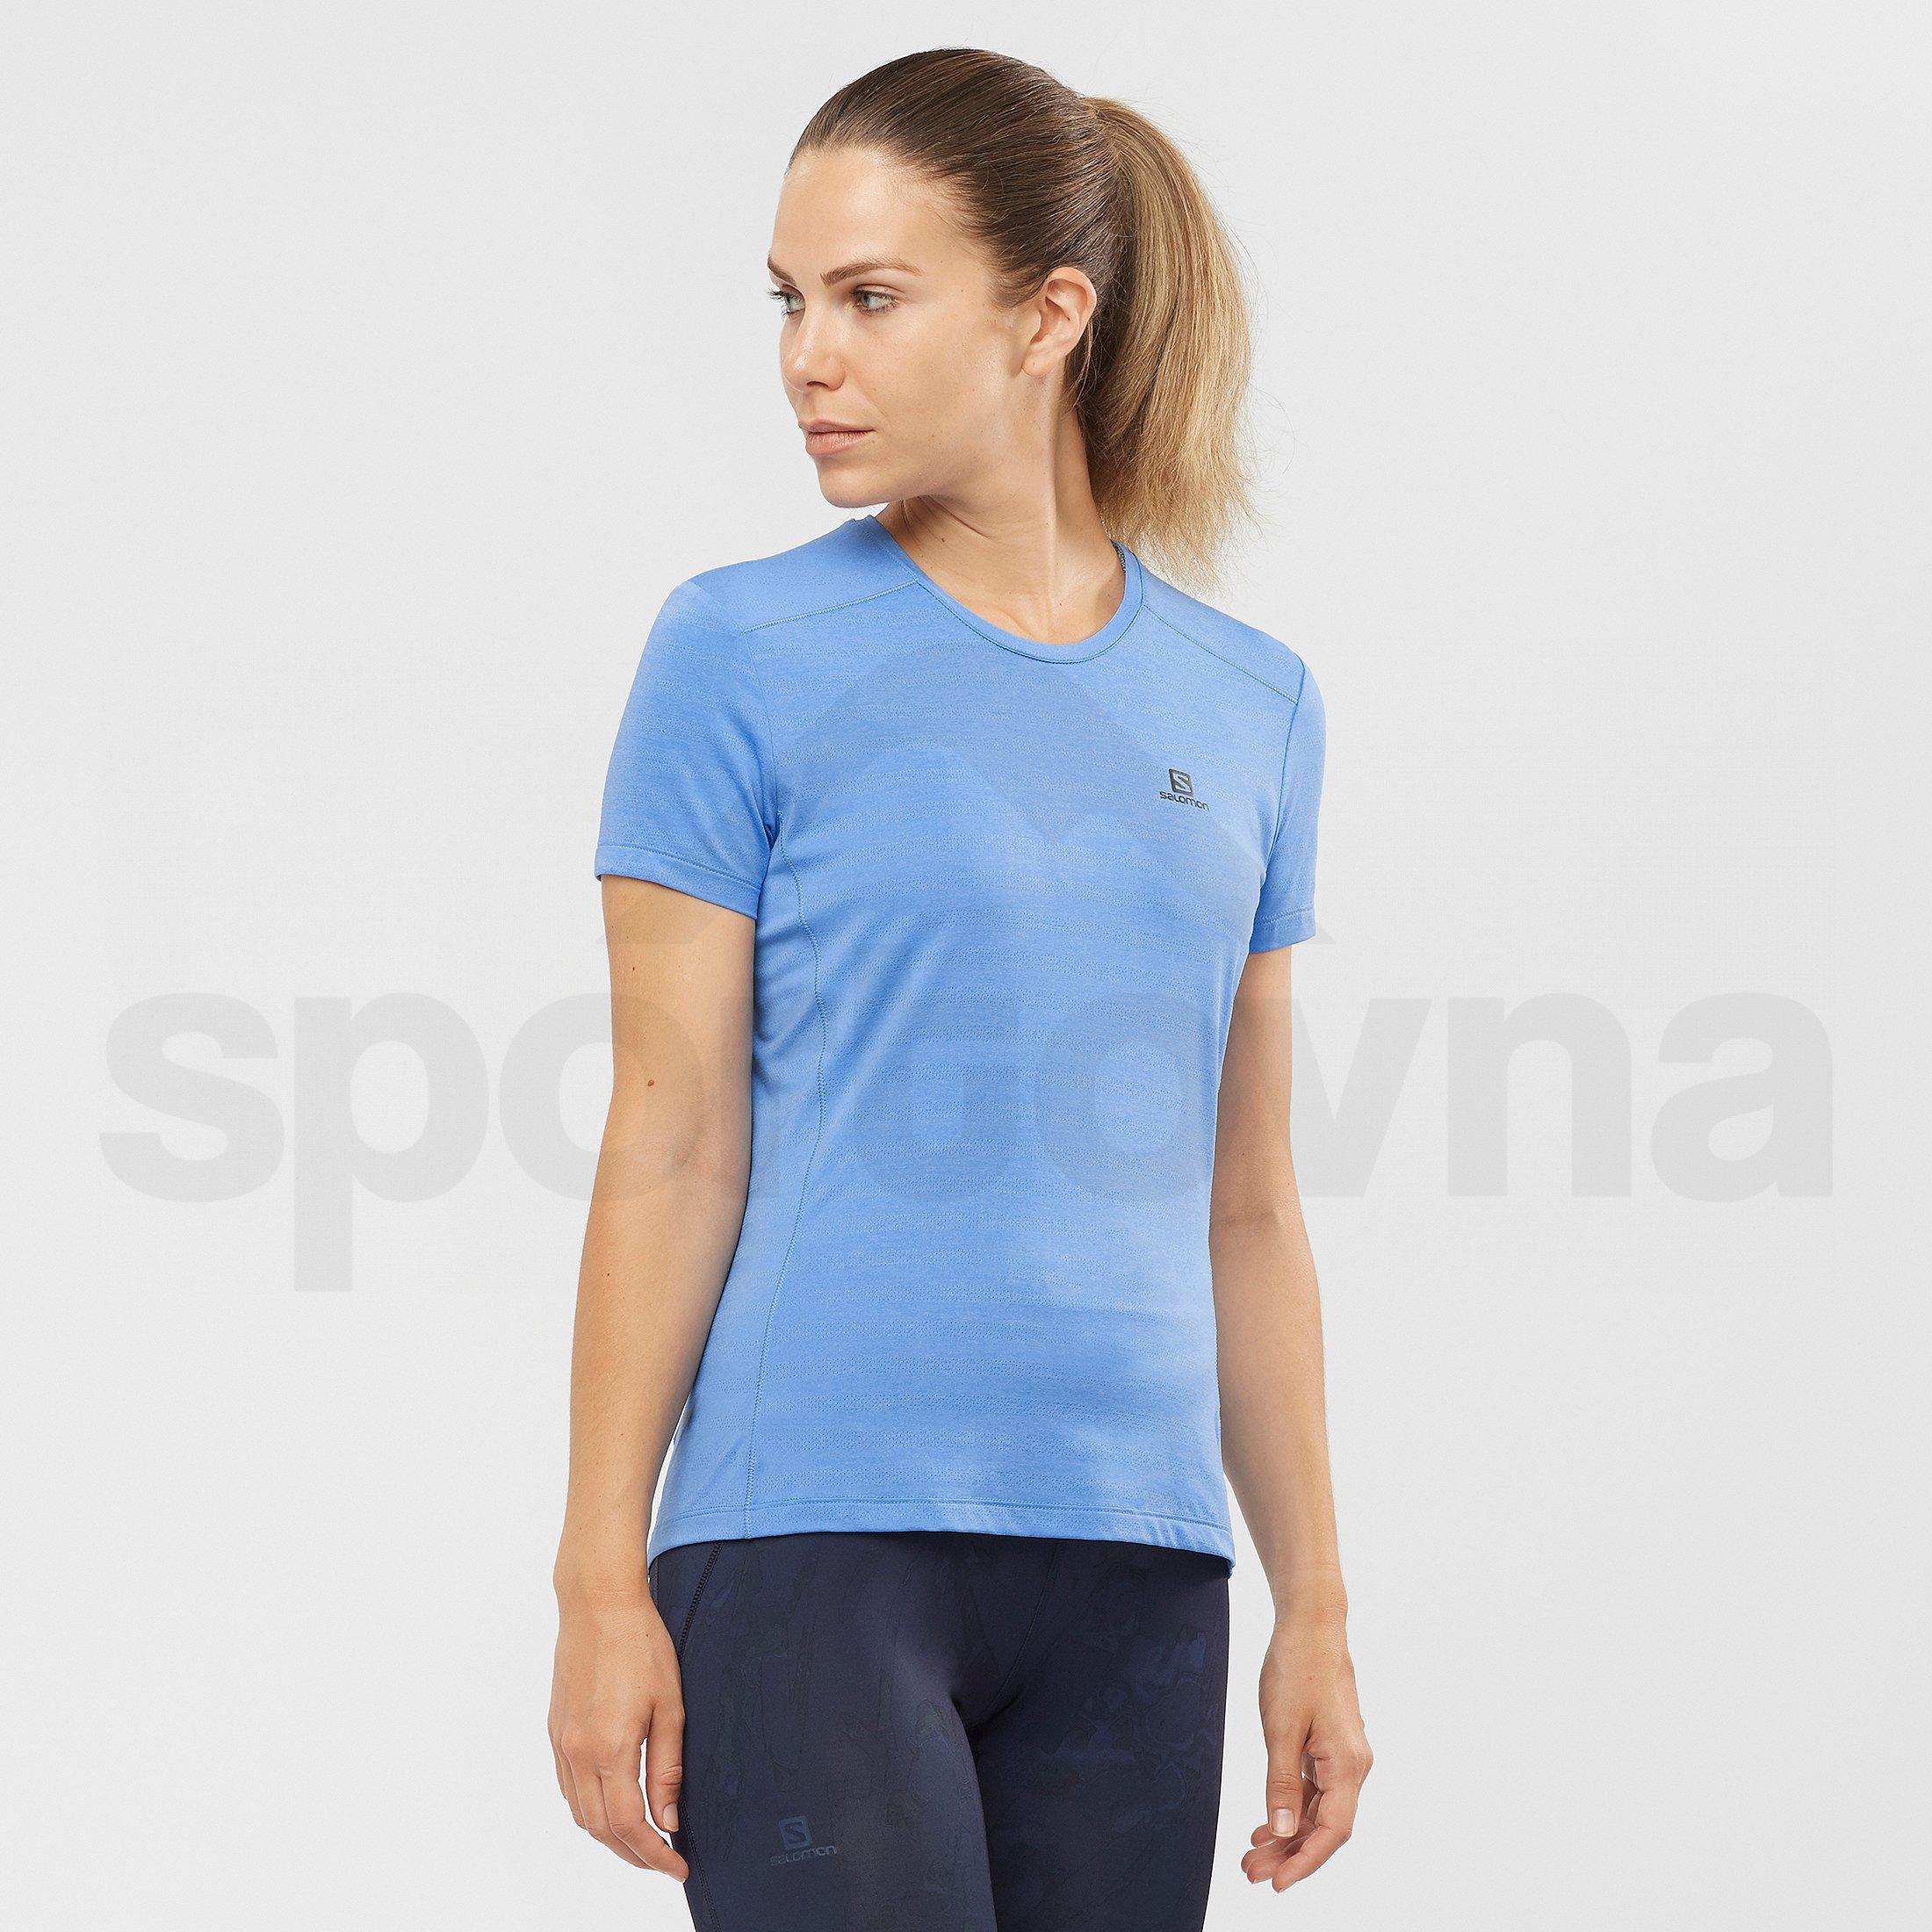 Tričko Salomon XA Tee W - modrá